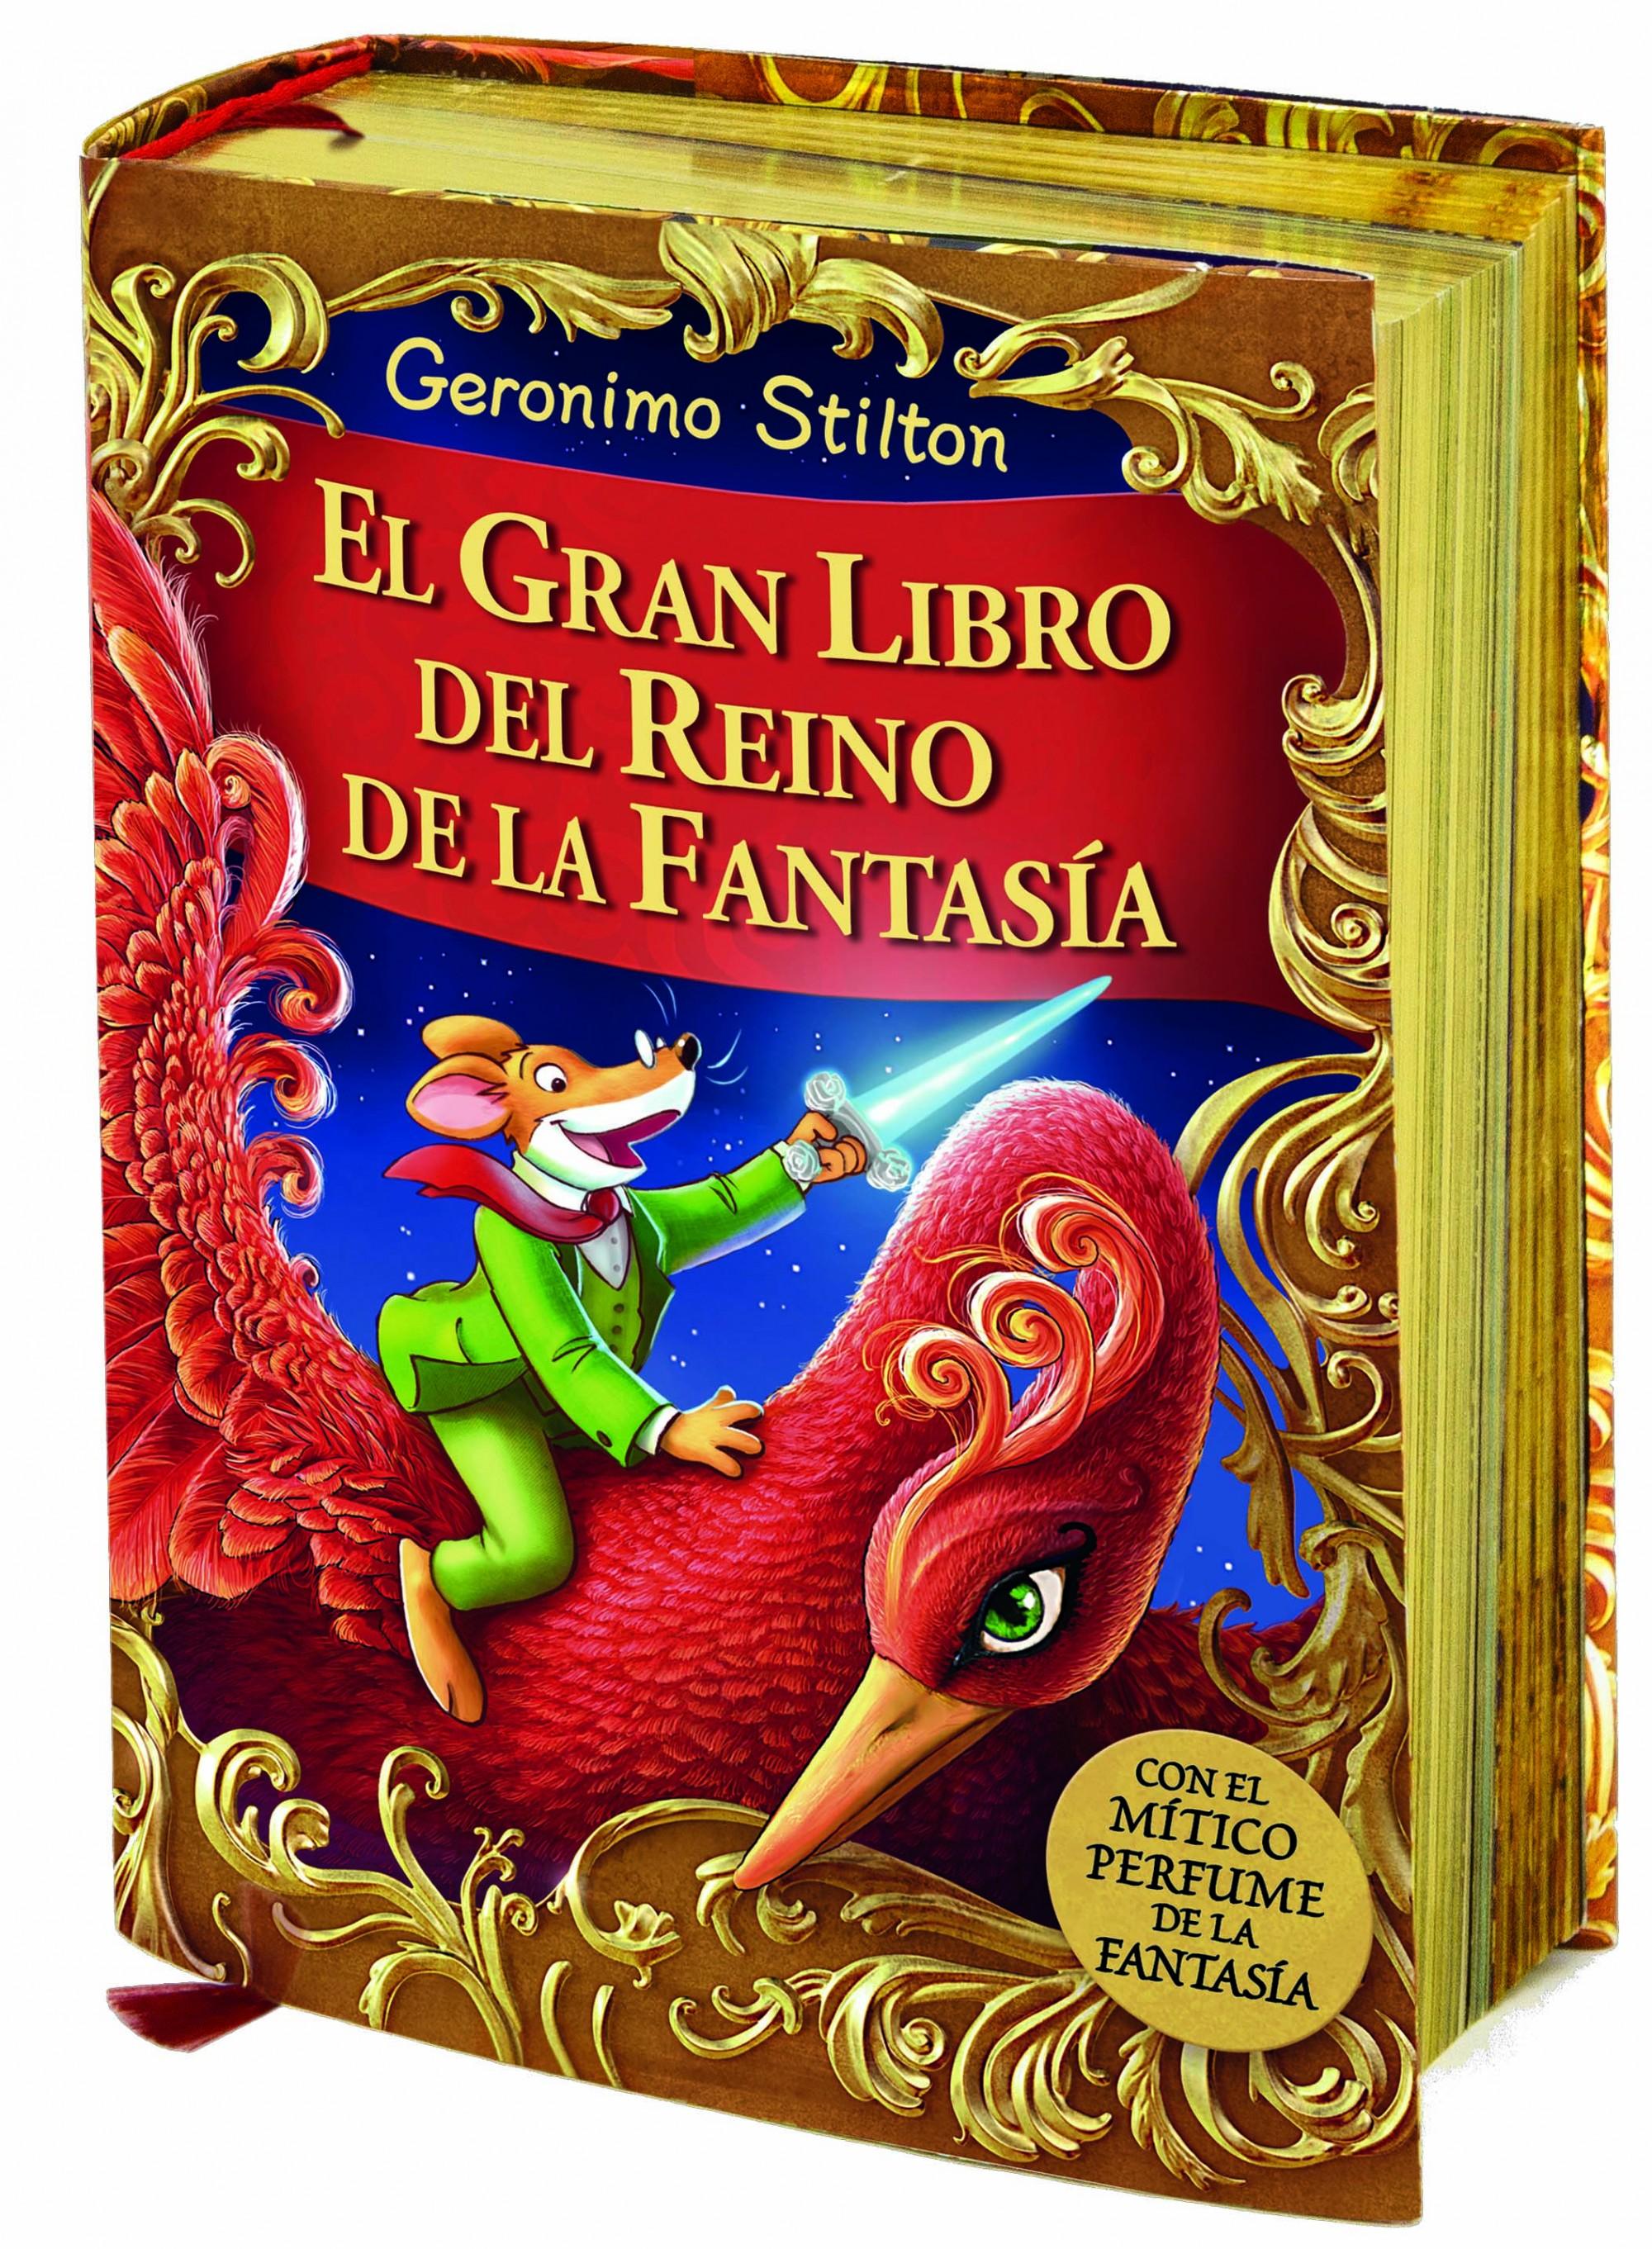 El gran libro del Reino de la Fantasia urrike liburudenda